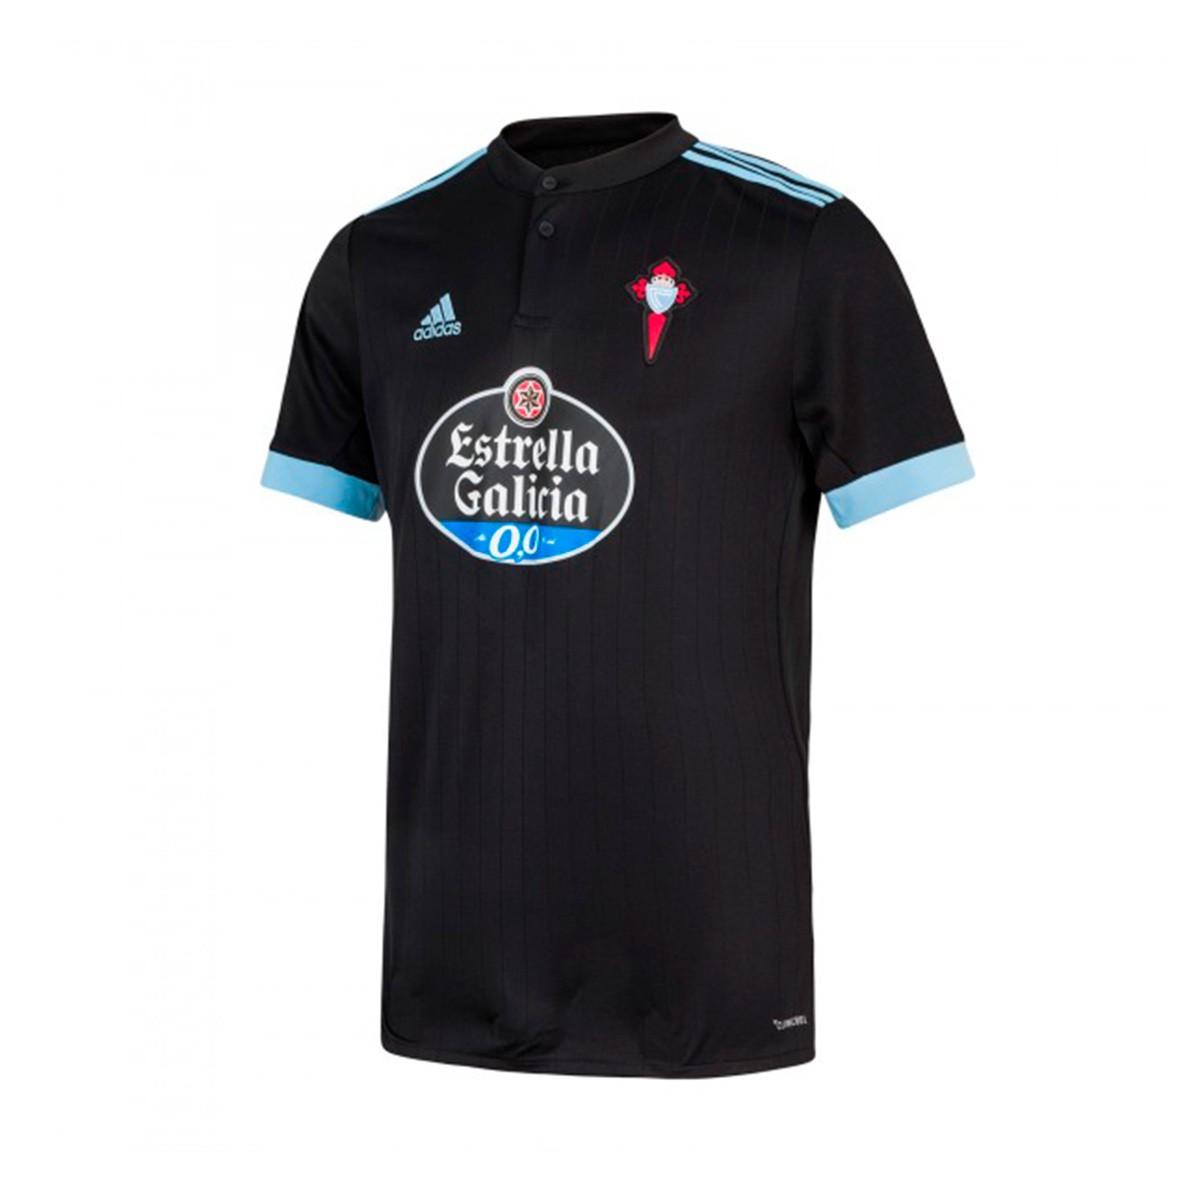 532e7778f Camiseta adidas Celta de Vigo Segunda Equipación 2017-2018 Niño Black-Clear  blue - Tienda de fútbol Fútbol Emotion